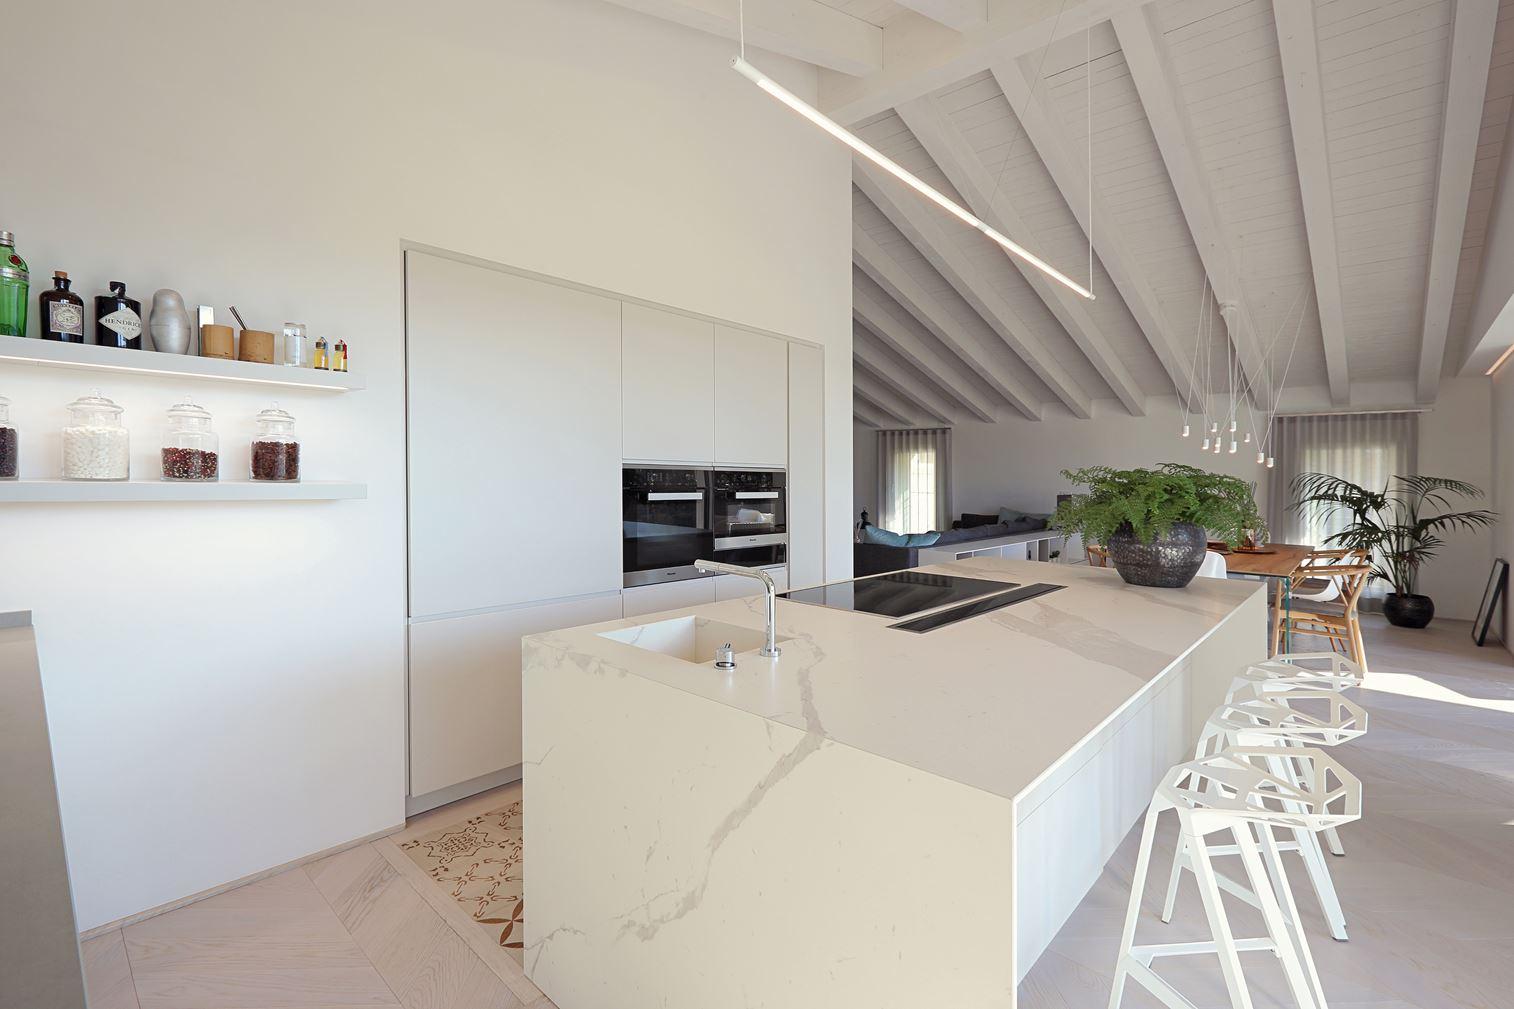 cucina e living - Mansarda.it